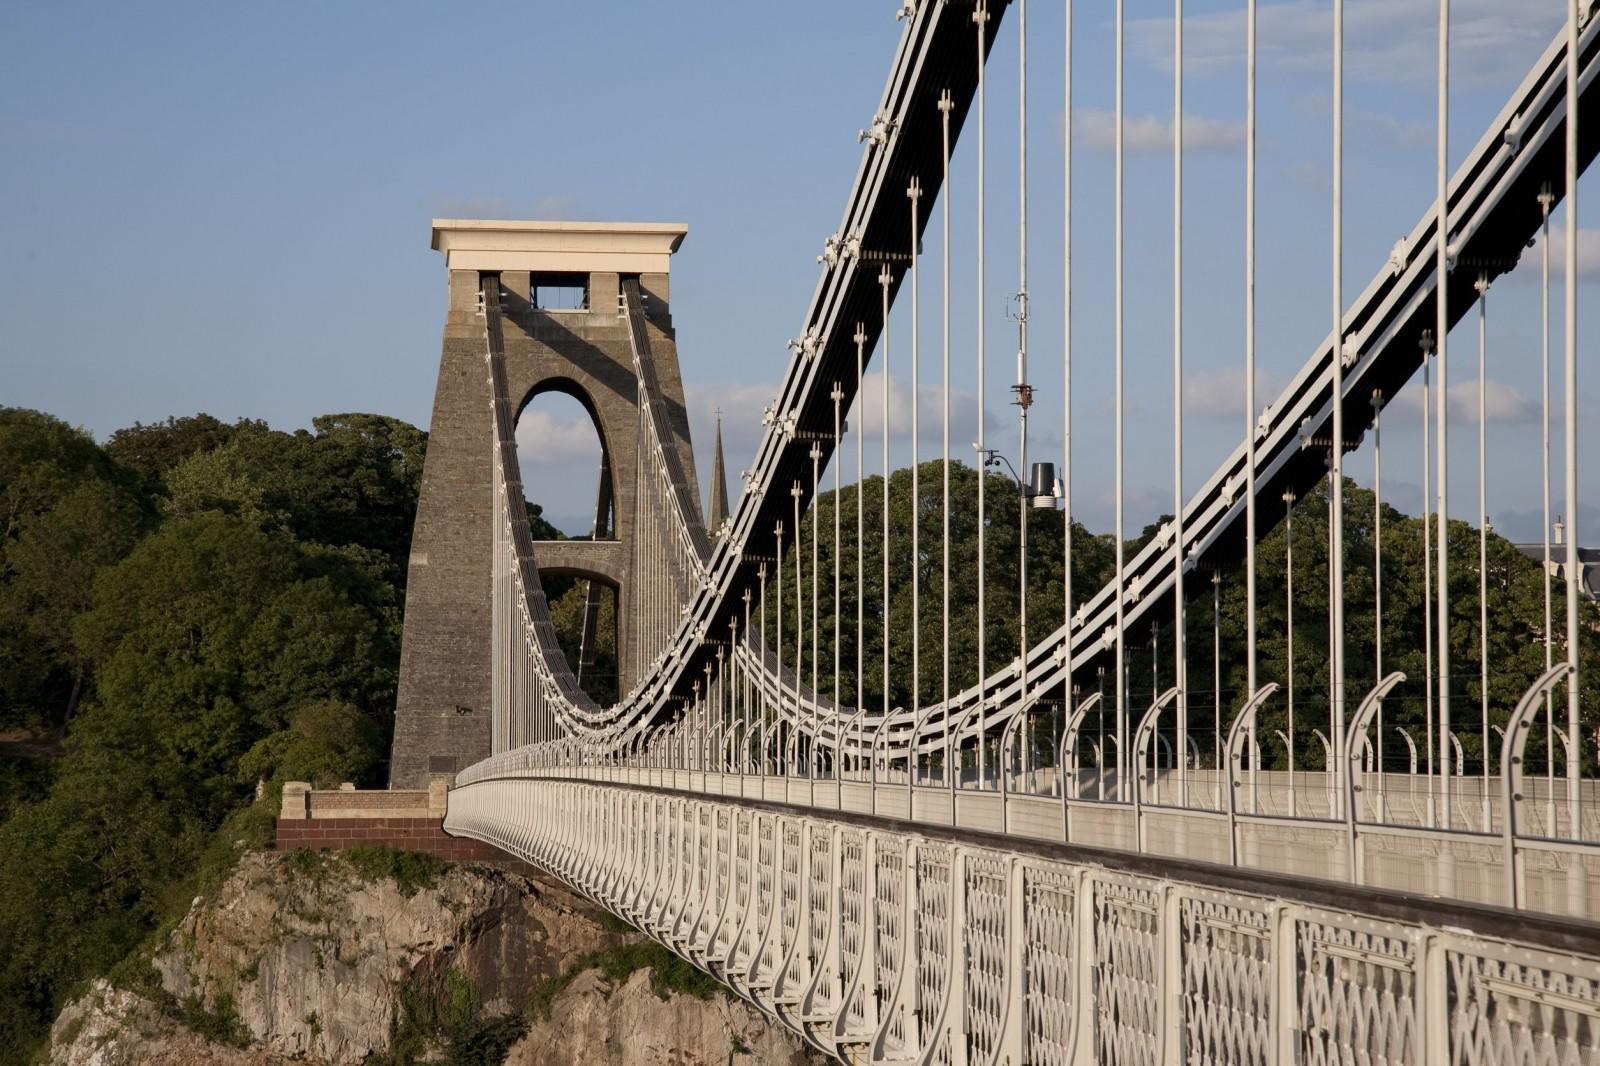 clifton suspension bridge world architecture. Black Bedroom Furniture Sets. Home Design Ideas